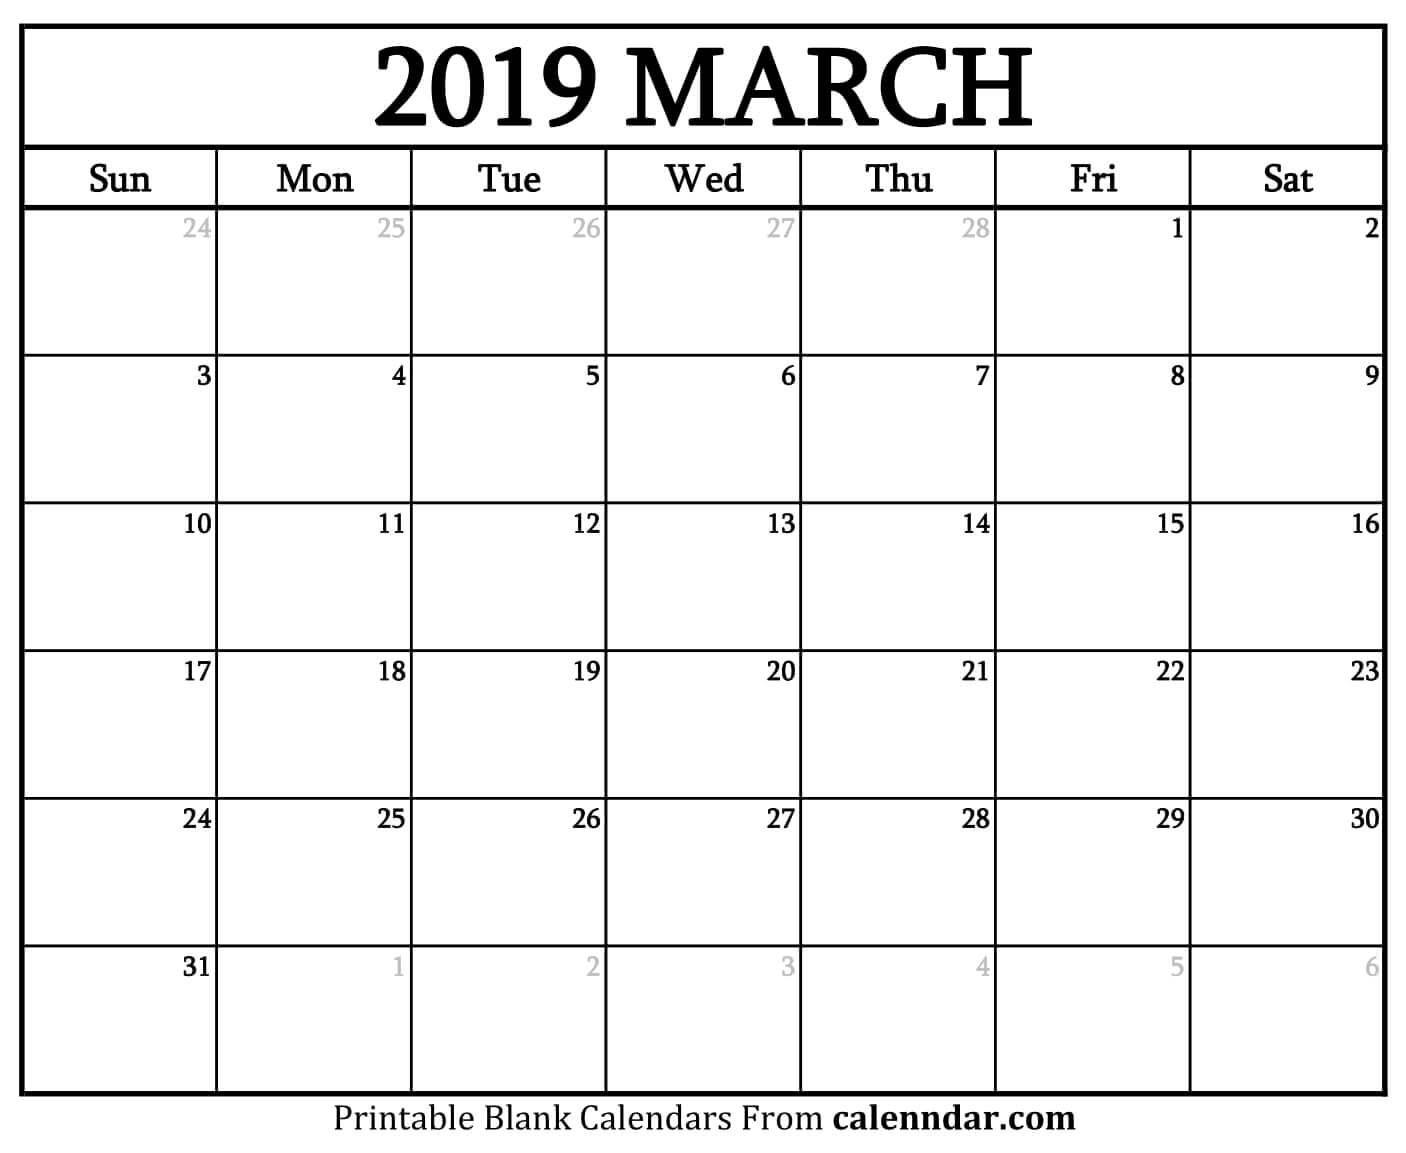 March 2019 Printable Blank Calendar Free March 2019 Calendar